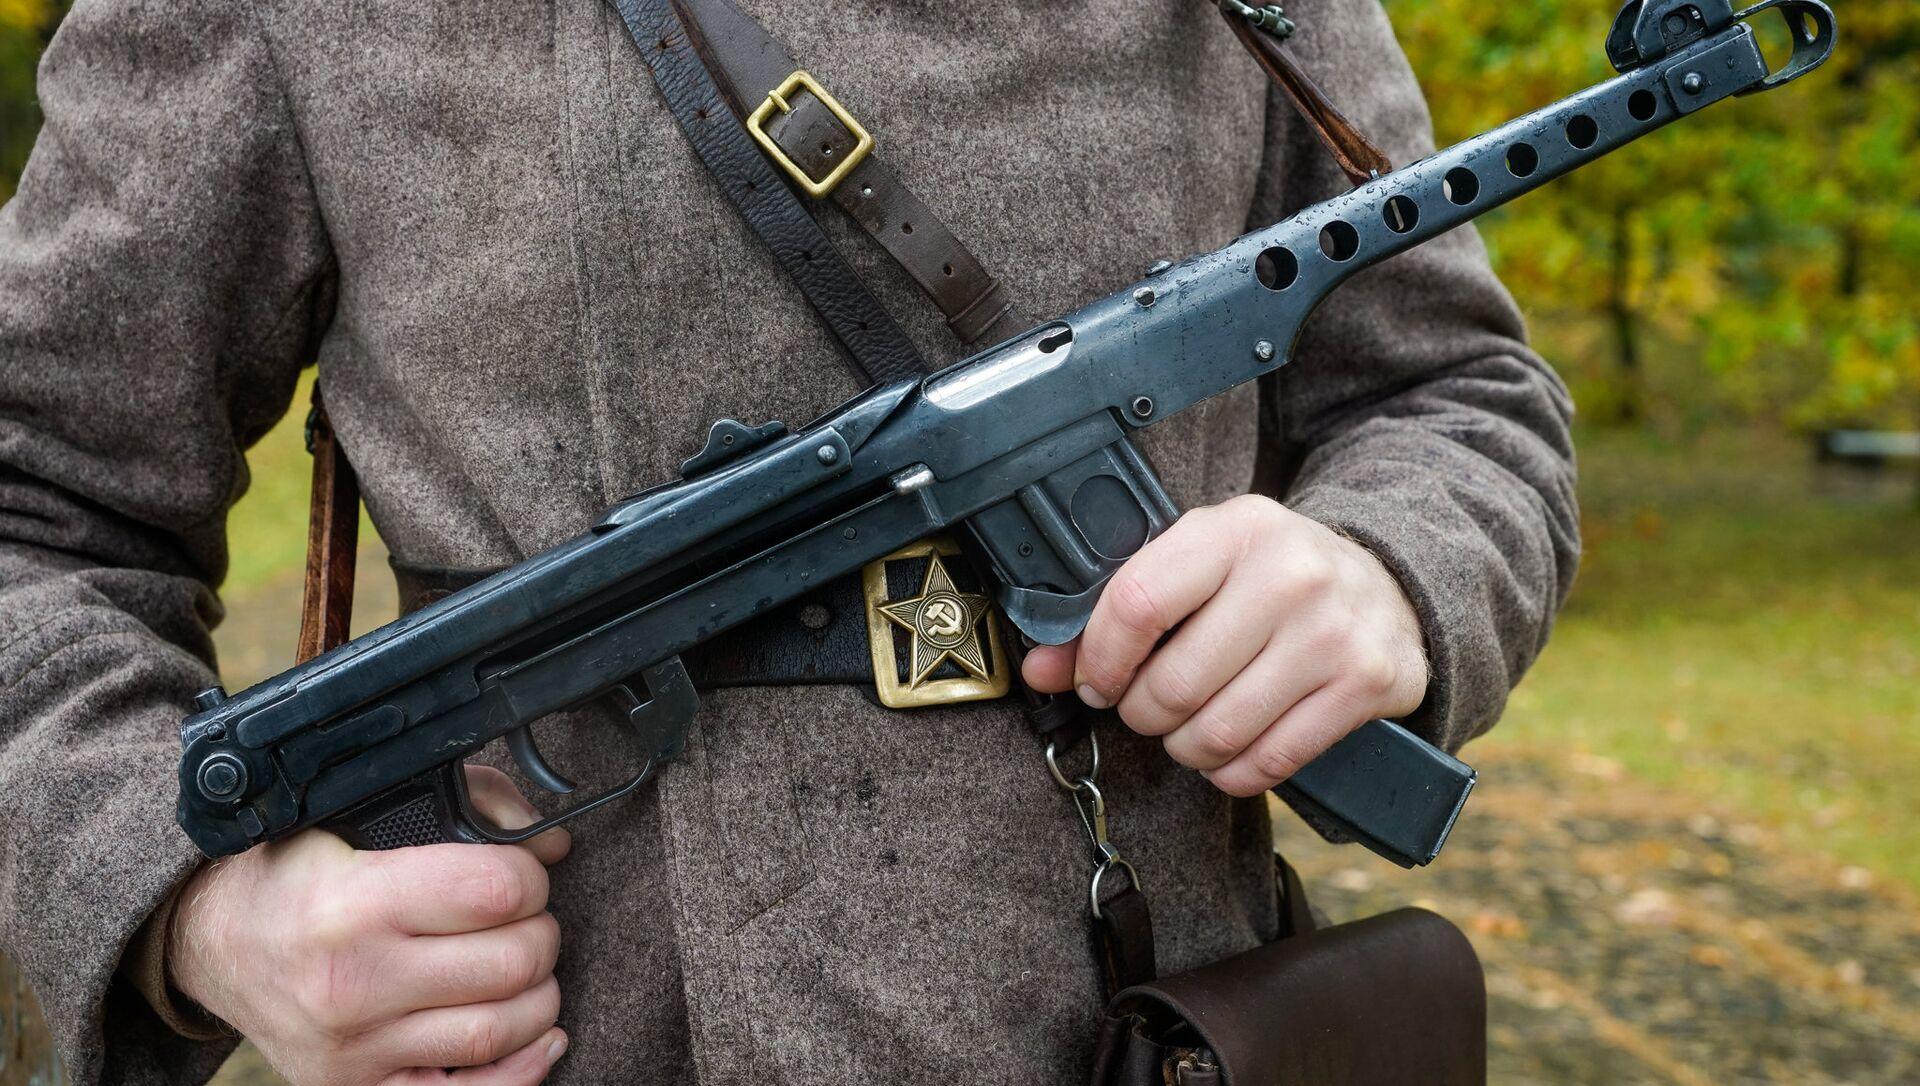 Пистолет-пулемет системы Судаева - Sputnik Latvija, 1920, 12.05.2021